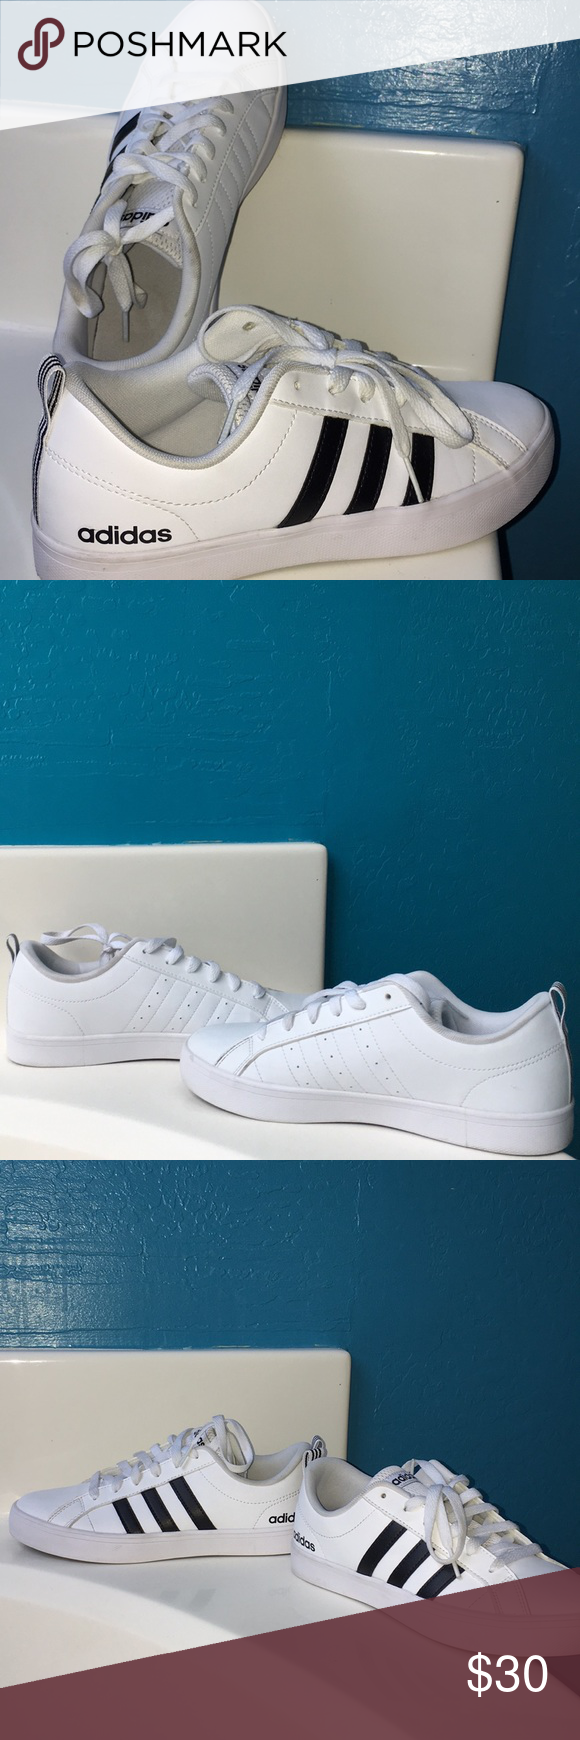 Adidas White Shoes With Black Stripes On One Side - Ajak Ngiklan